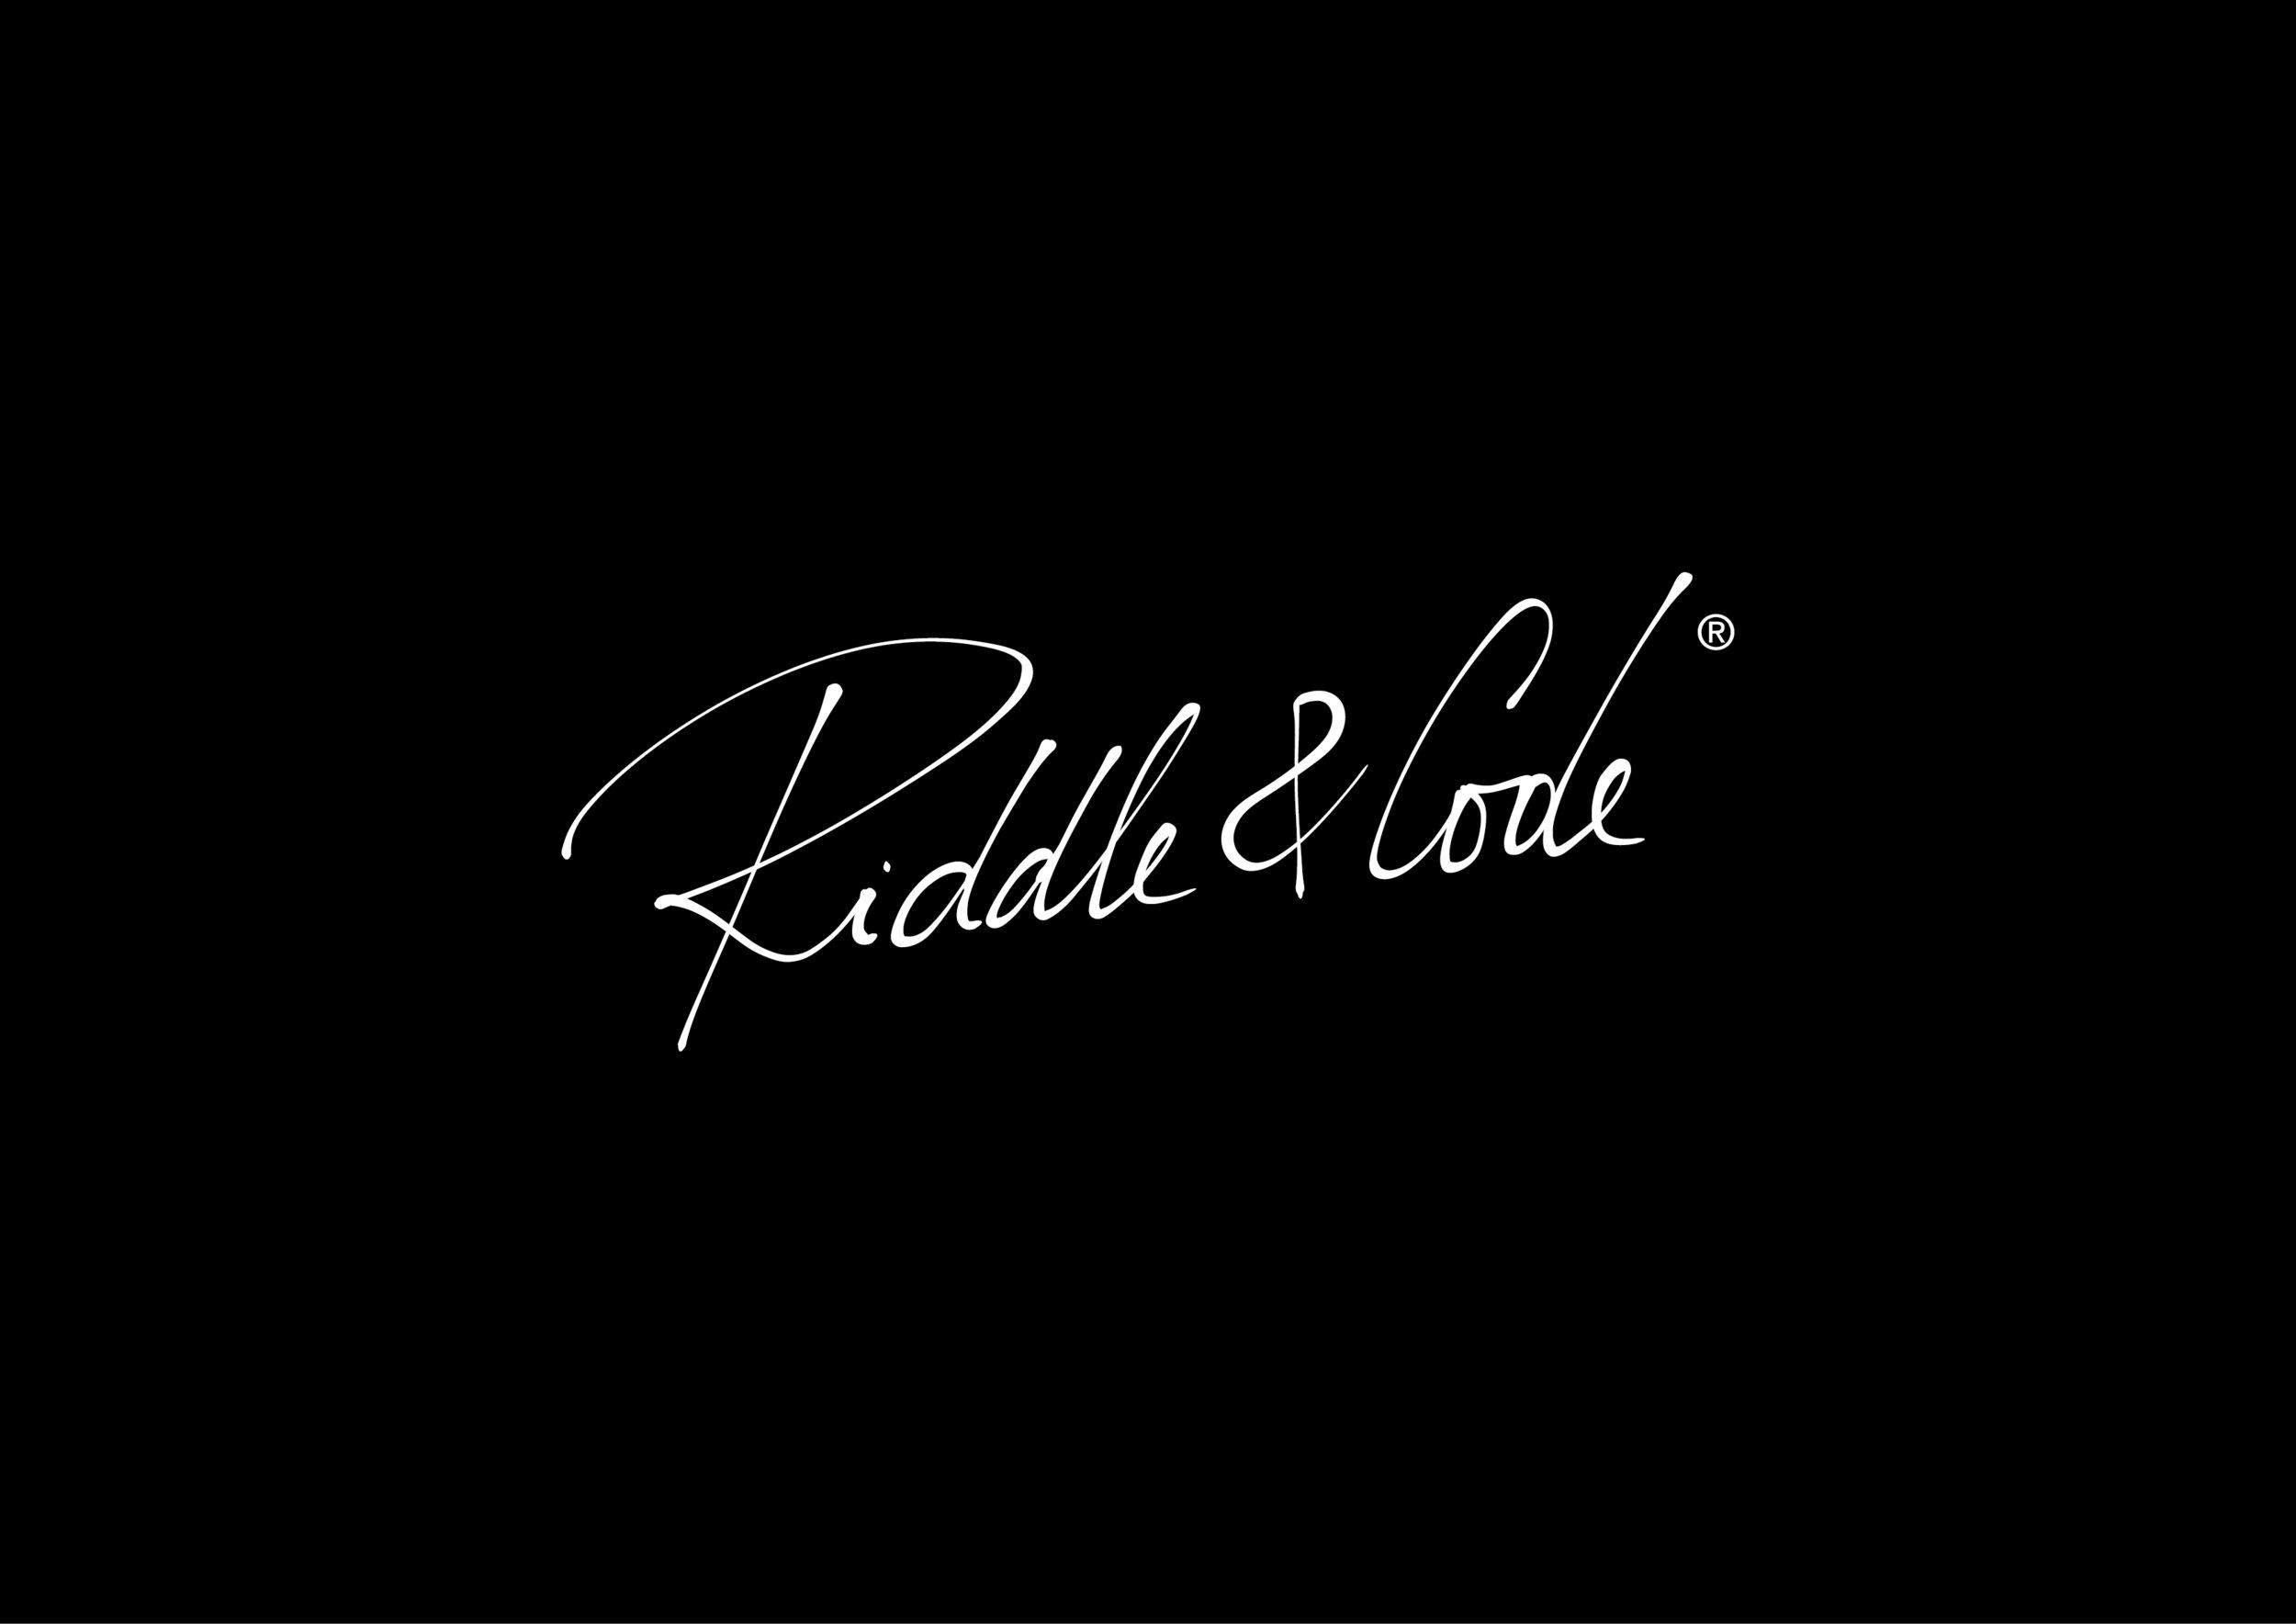 RIDDLE&CODE_MAINLOGO_NEG.jpg